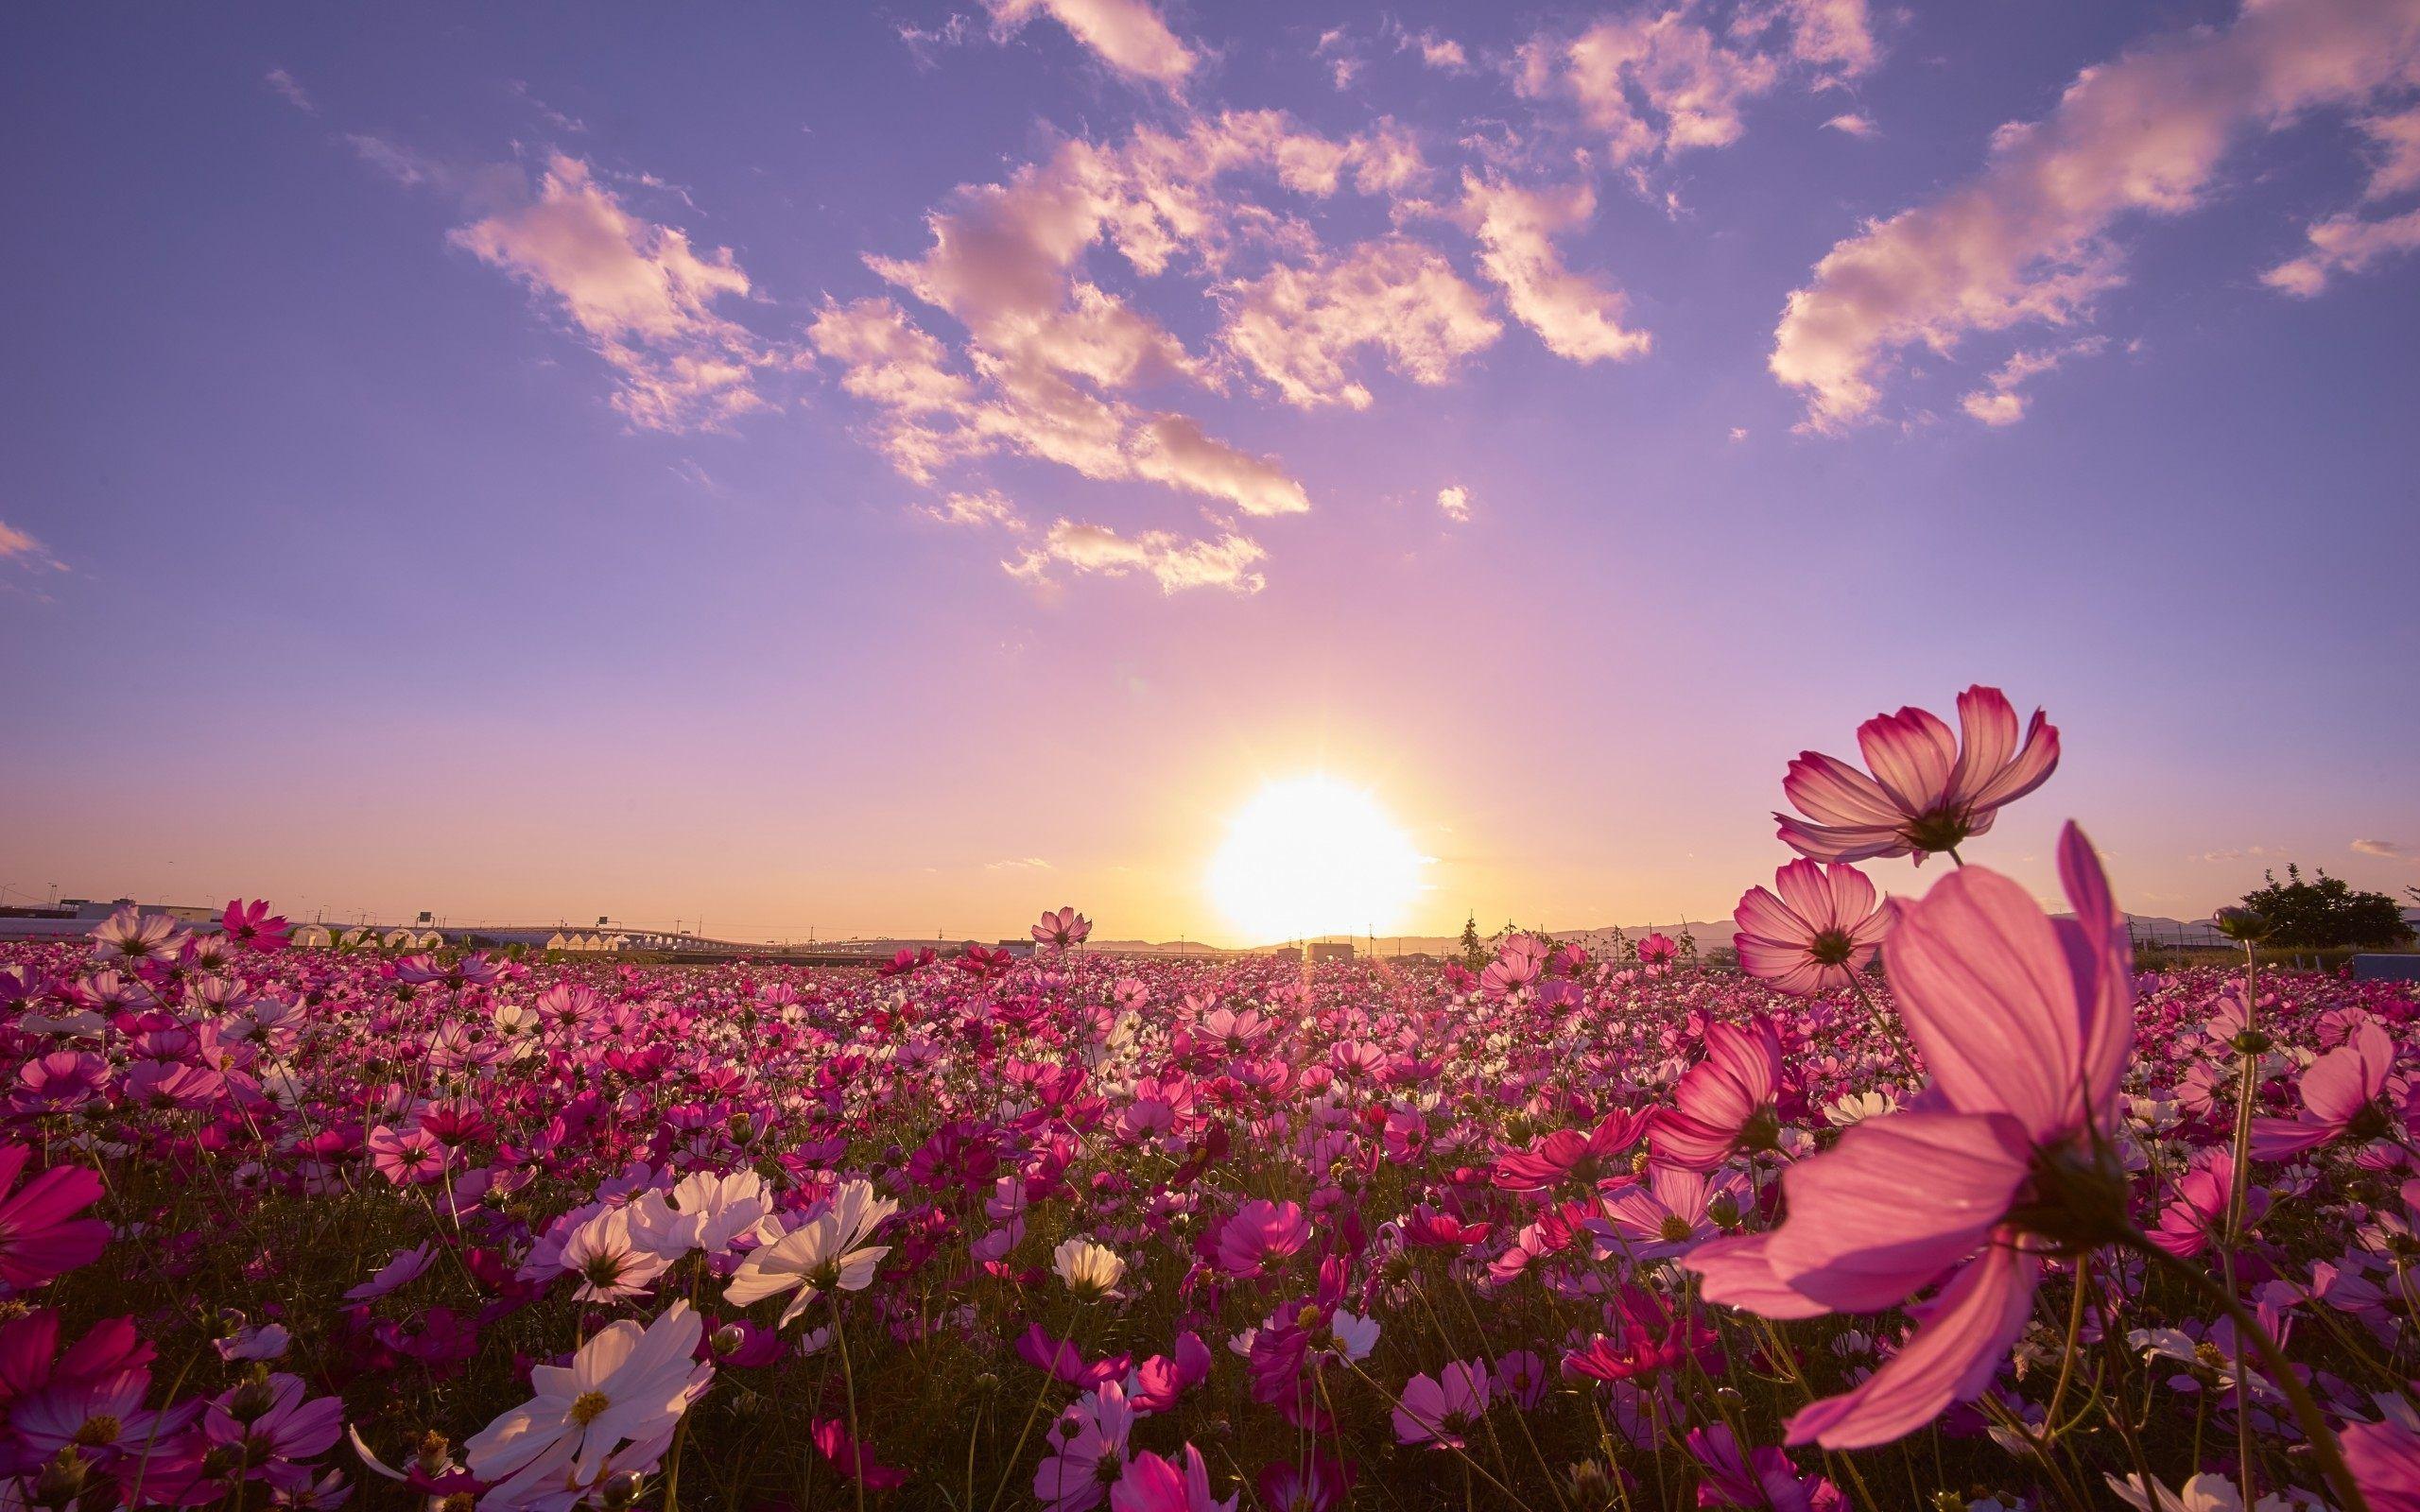 hitachi seaside park flower fields wallpaper hd for